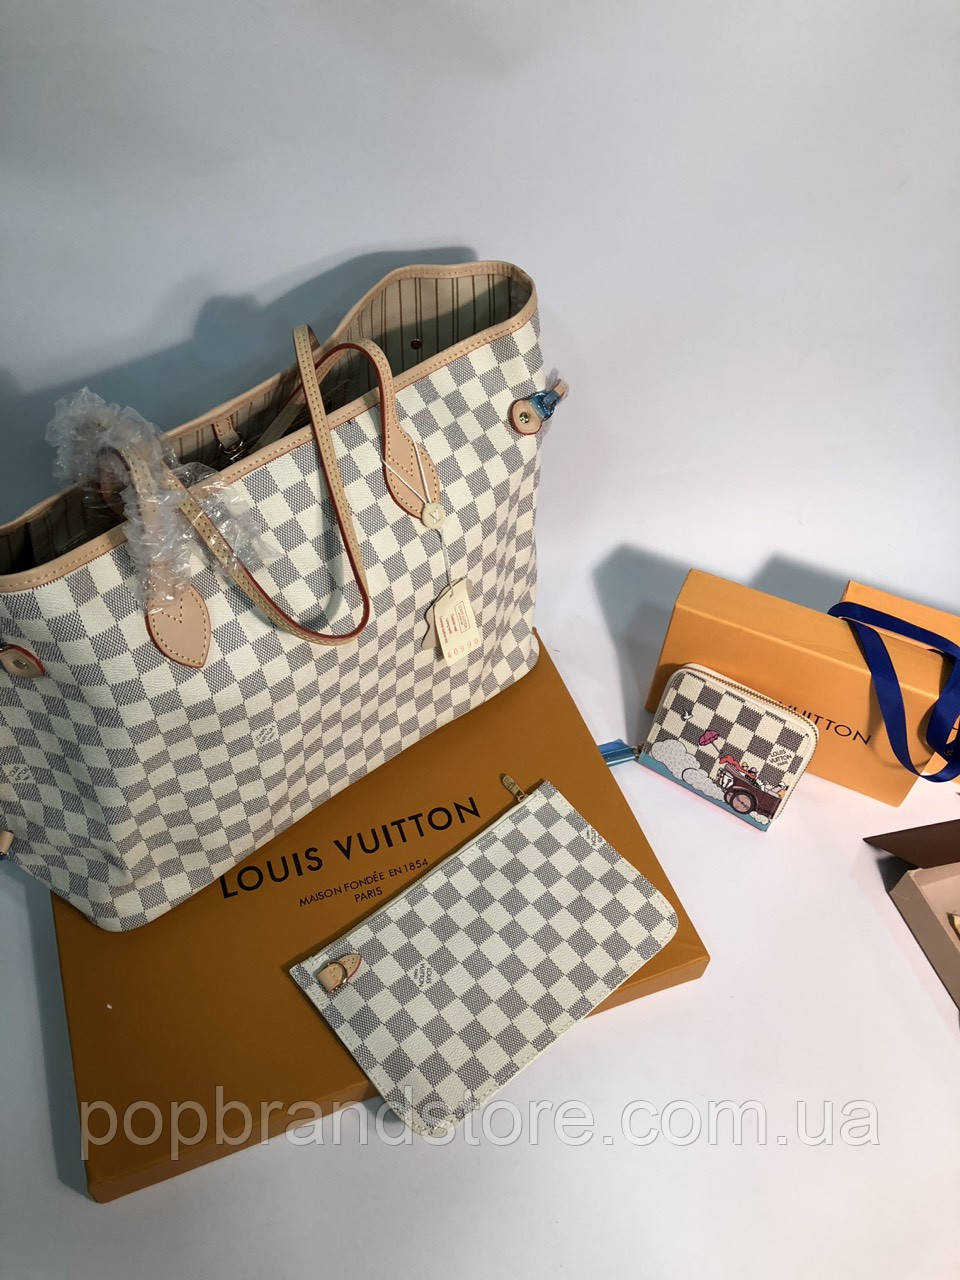 c9ed44c2e445 Популярная женская сумка Louis Vuitton Neverfull (реплика): продажа ...